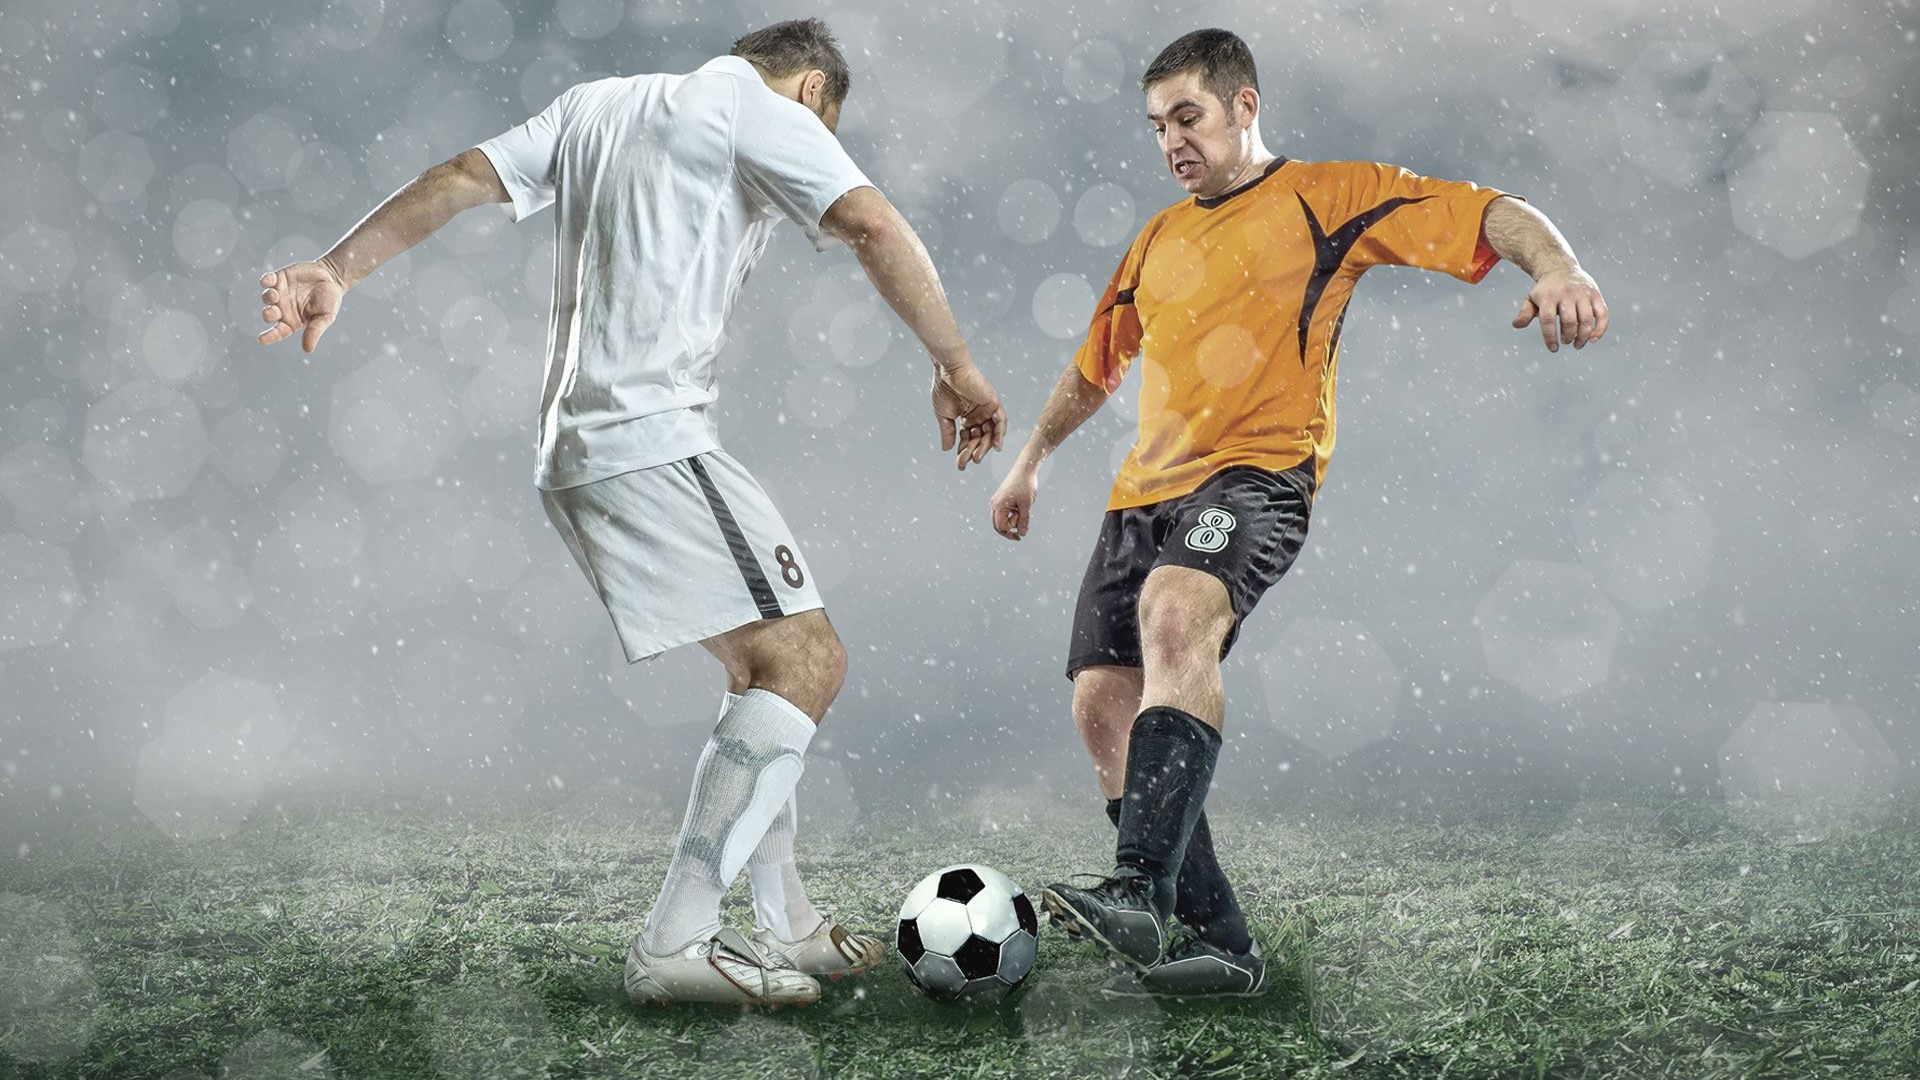 watch-stade-francais-paris-vs-krasny-yar-live